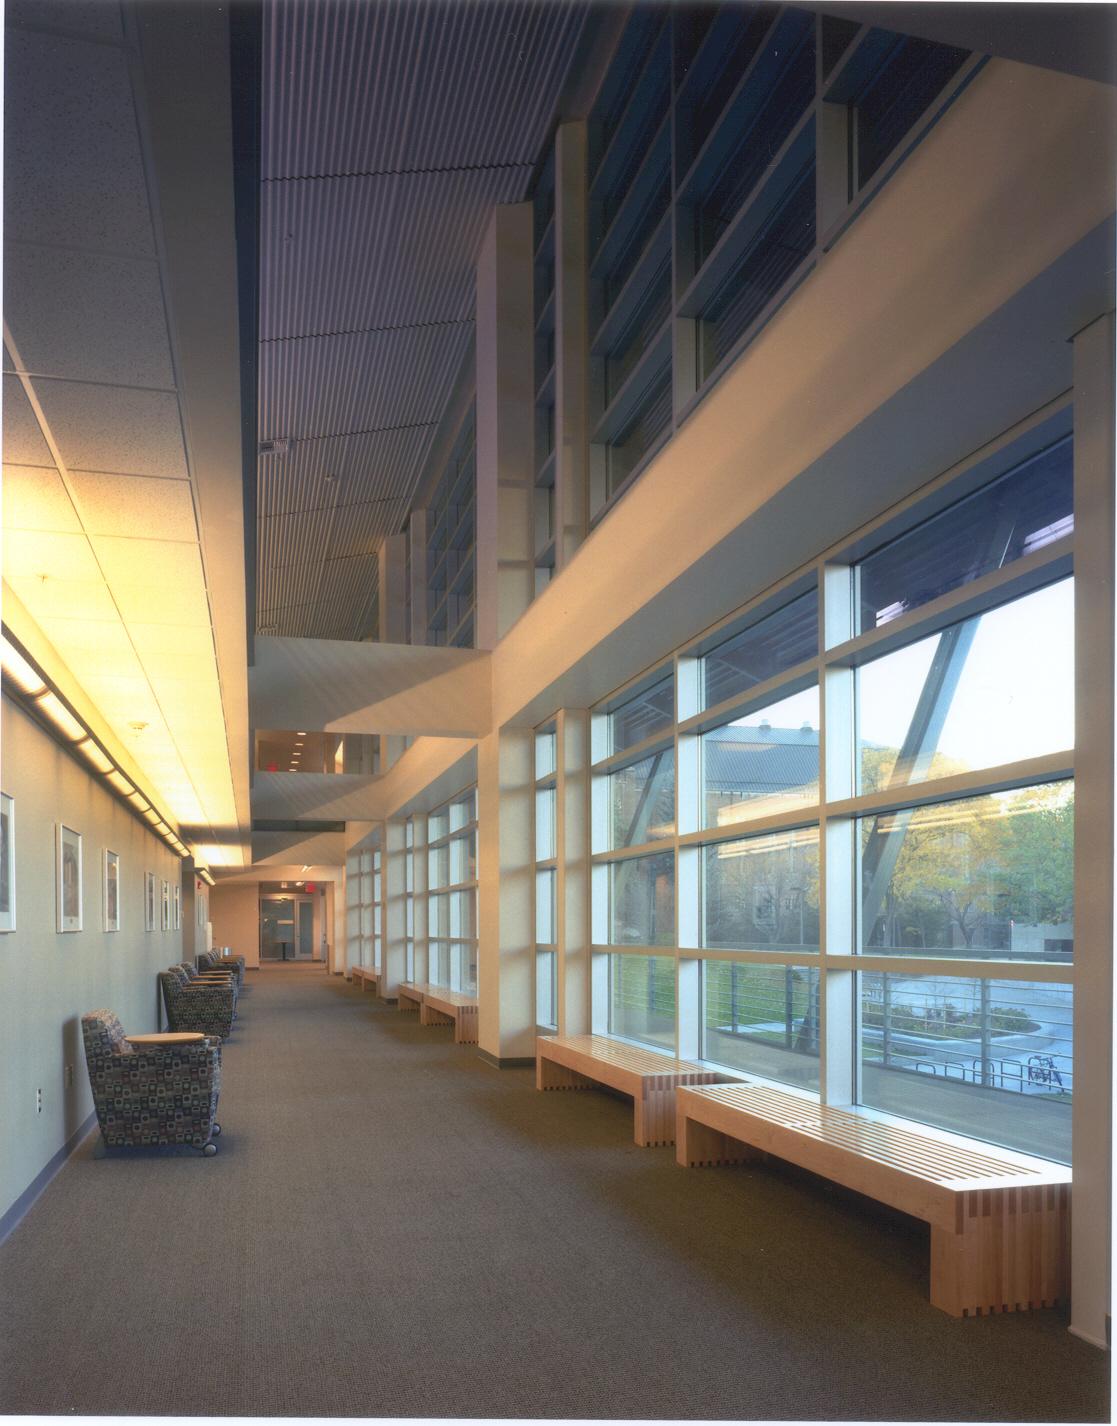 Interior Hallway.jpg